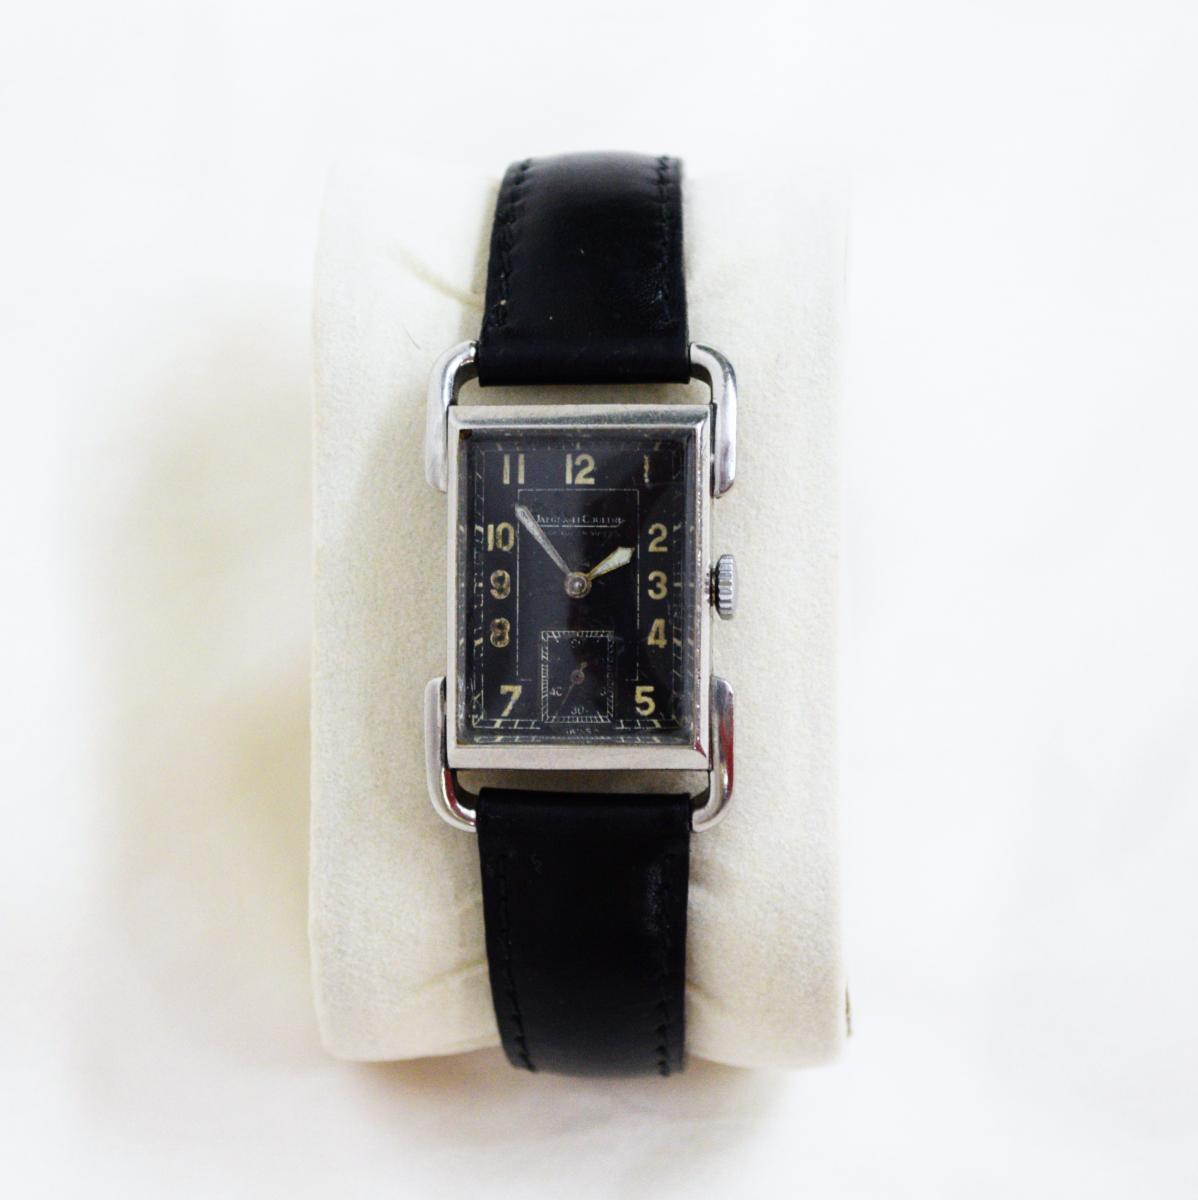 Jaeger Lecoultre Model Etrier Curvex Circa 1930 Watch